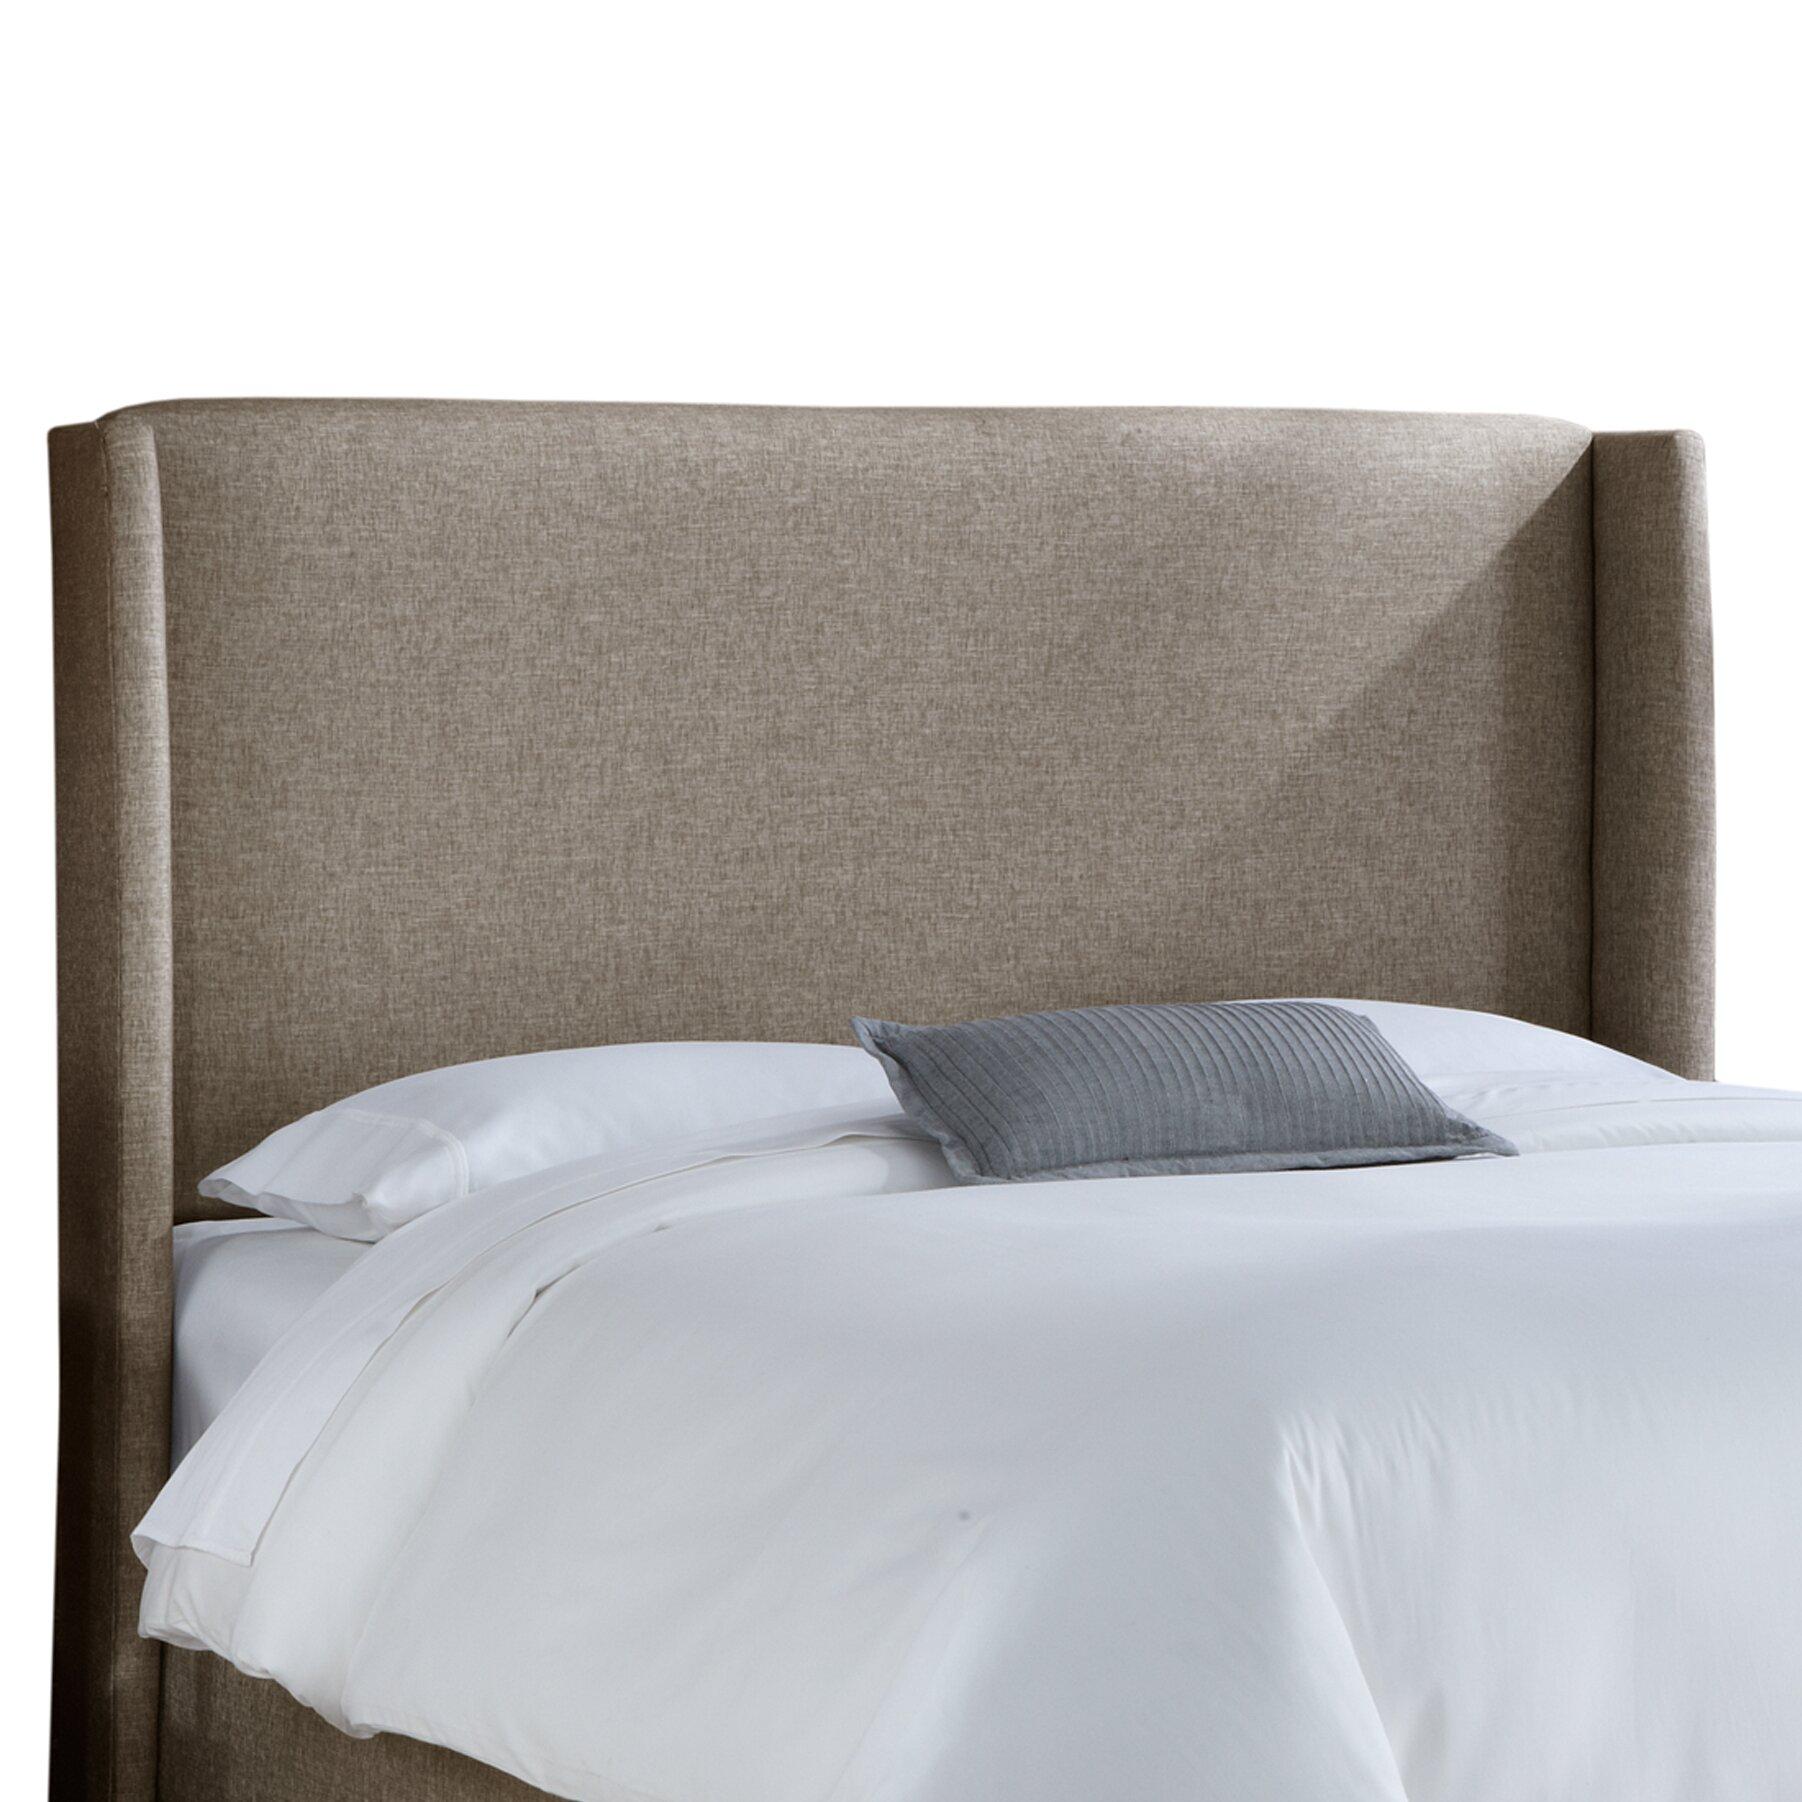 Skyline Furniture Wingback Upholstered Headboard Reviews Wayfair